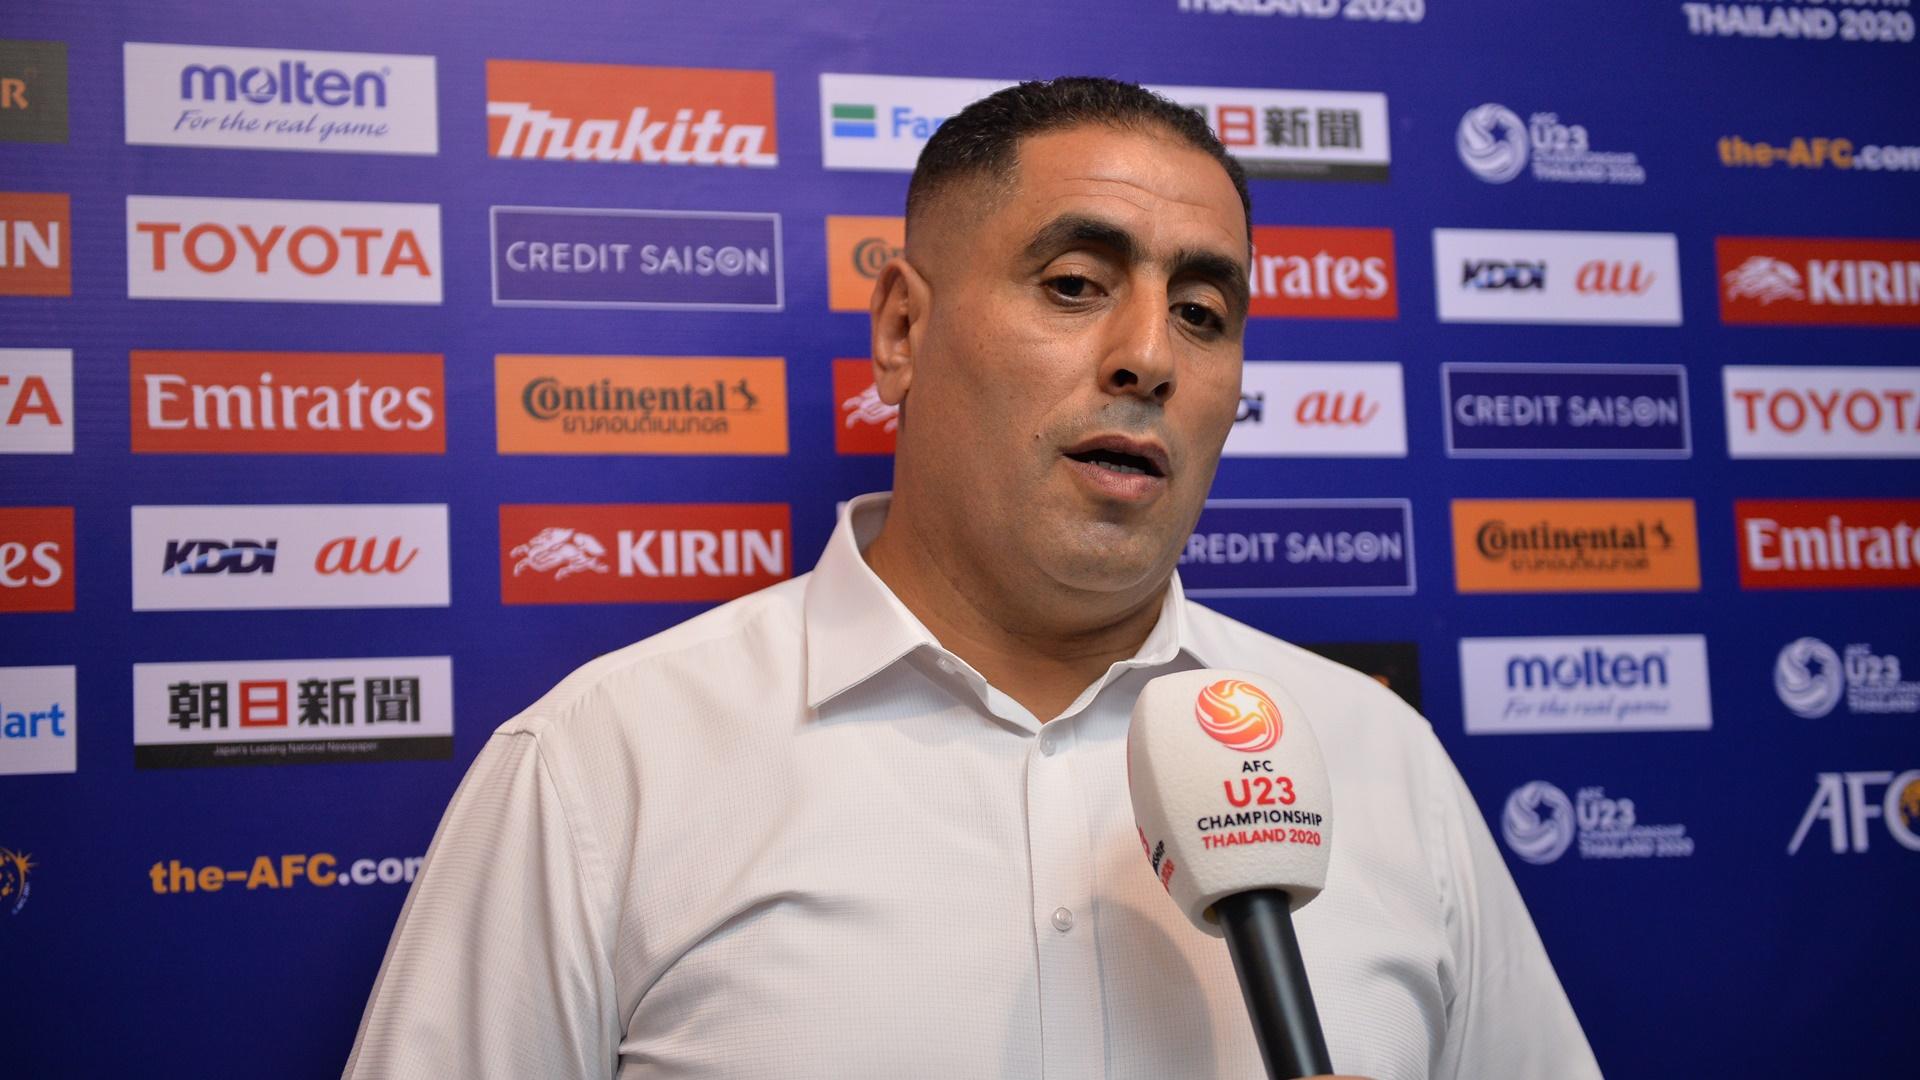 coach-ahmed-abdel-qader-u23-dpr-korea-vs-u23-uae-afc-u23-championship-2020-group-stage_1dbcvy8l3tdzj16p19ov154l73_1